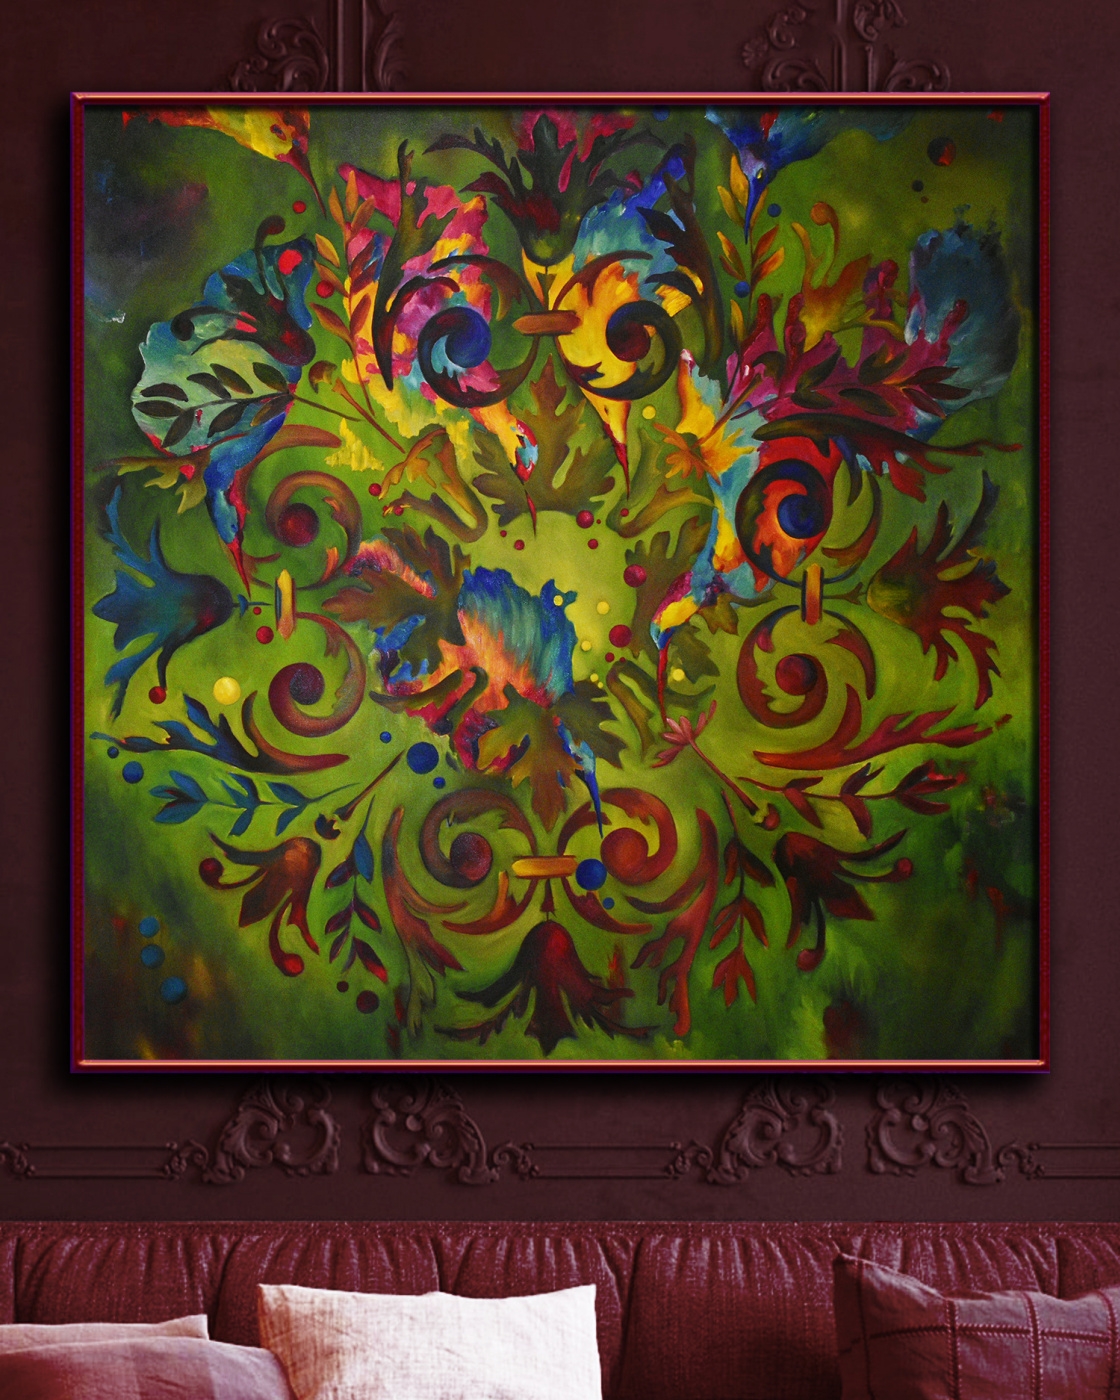 BIRDS and BERRIES 110*110 cm, original oil painting